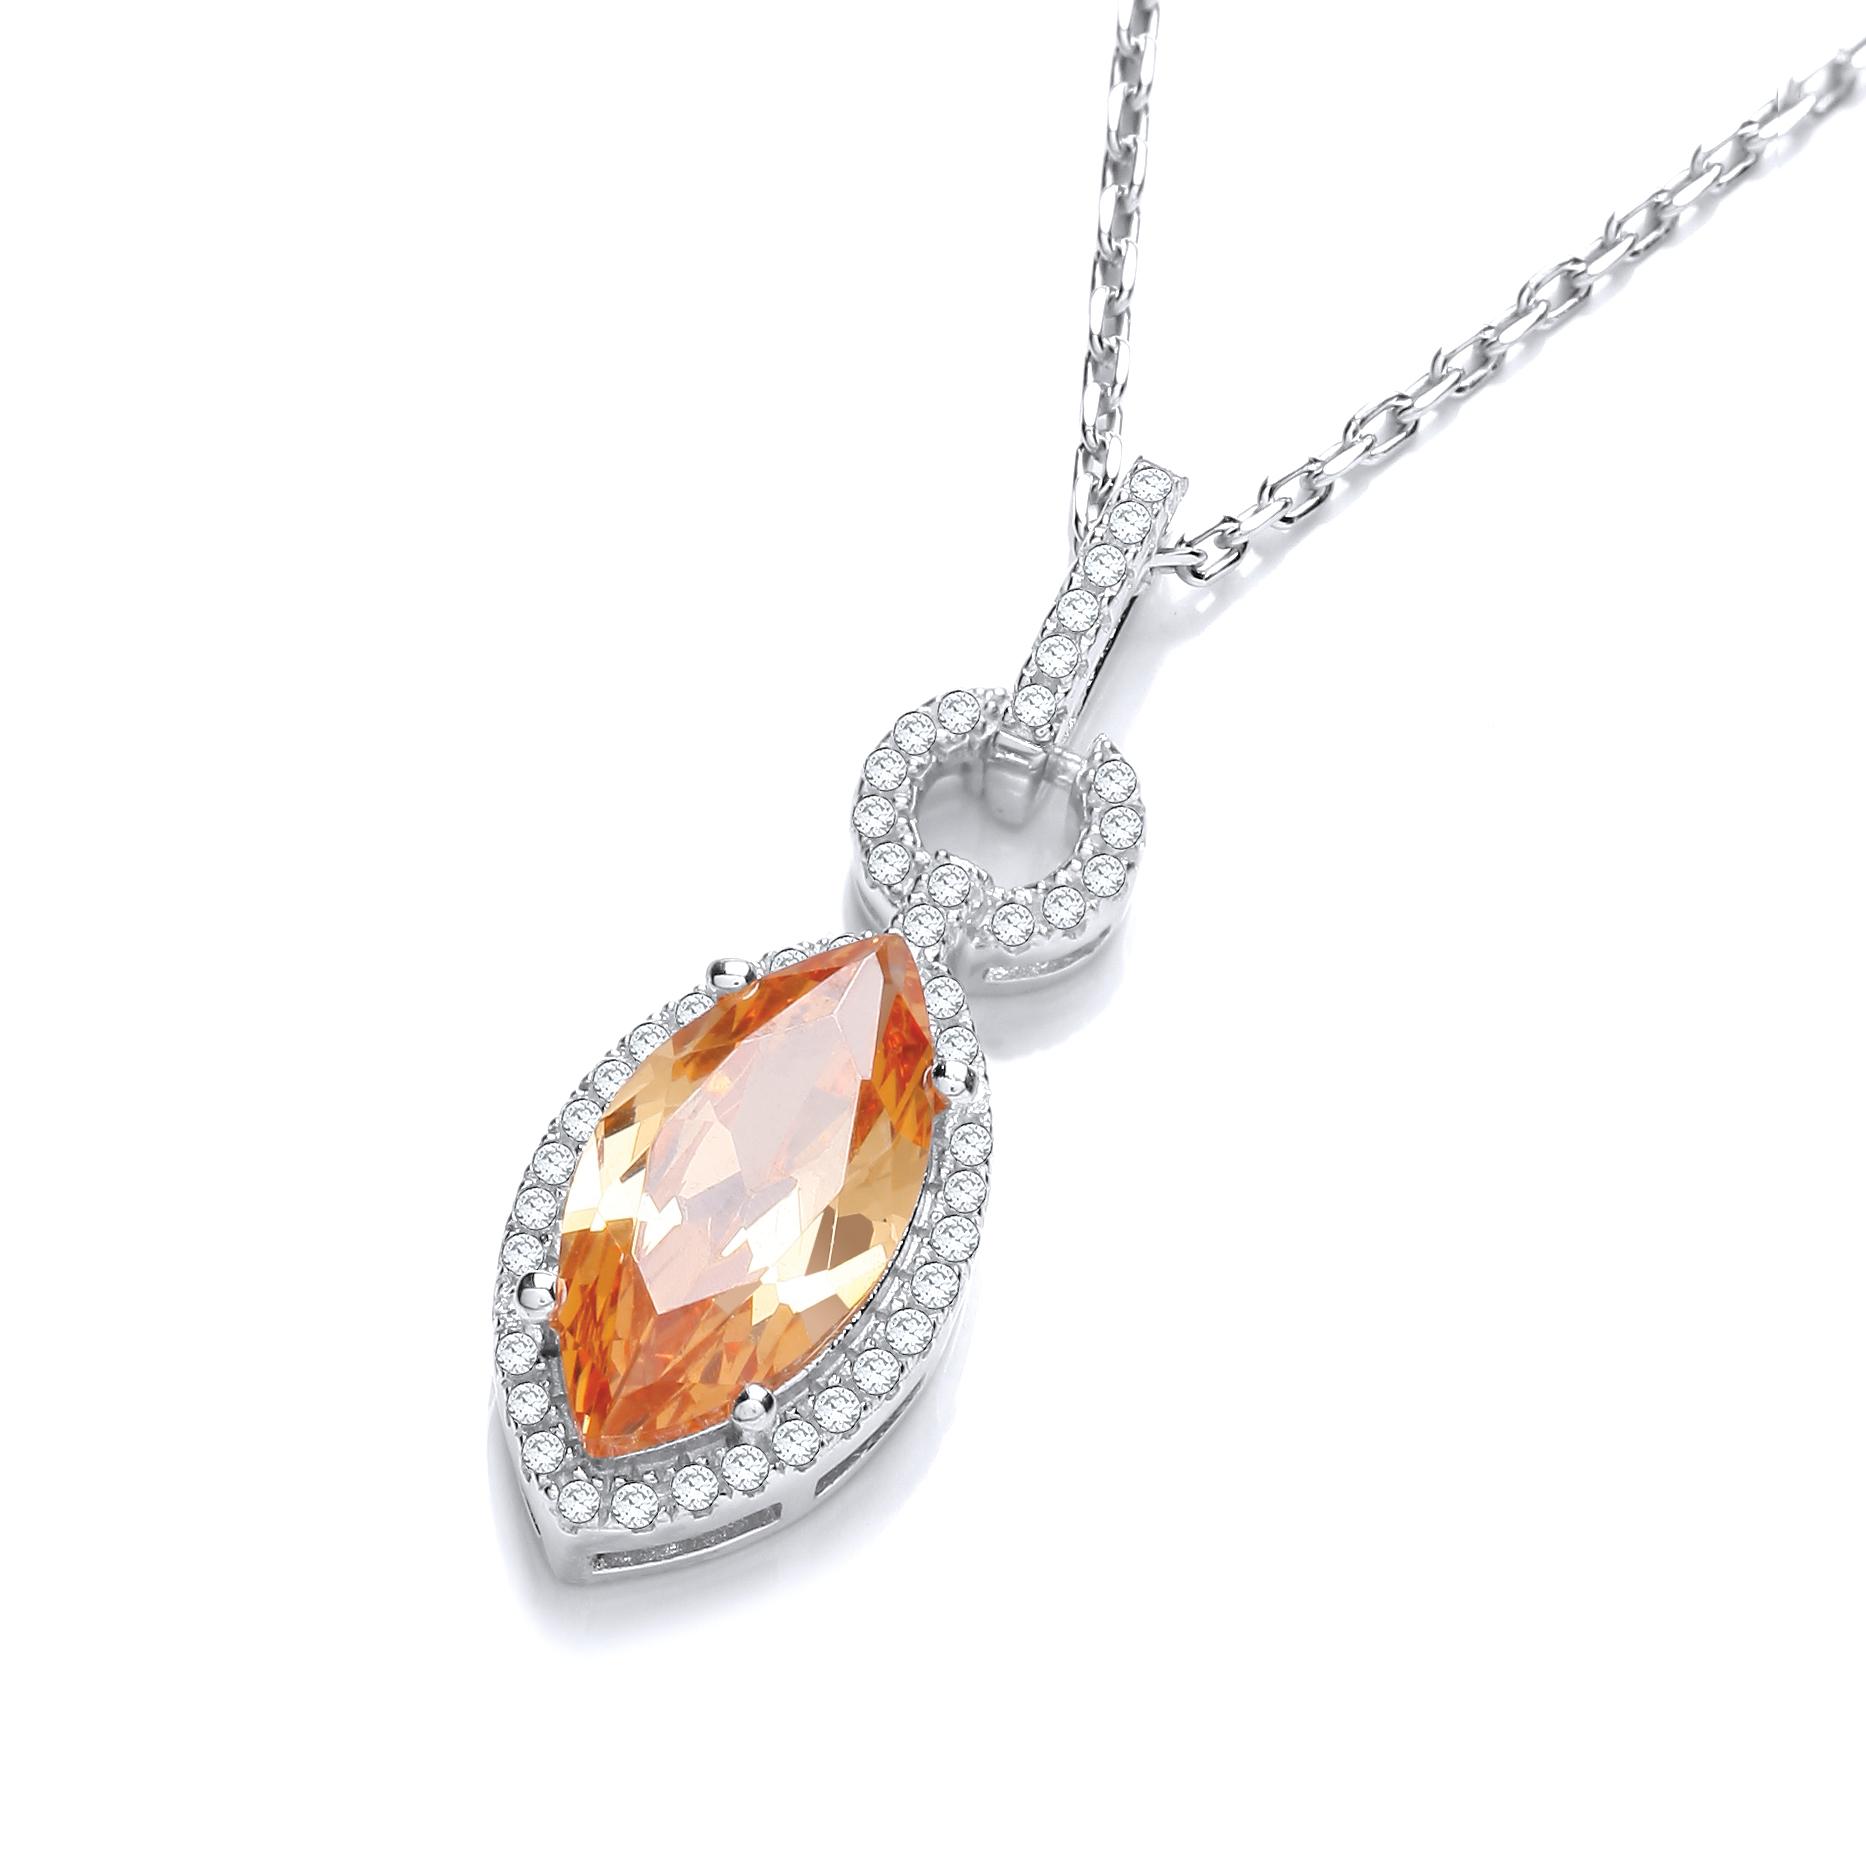 Jjaz Champagne Diamond Pendant 925 Sterling Silver Women Valentines